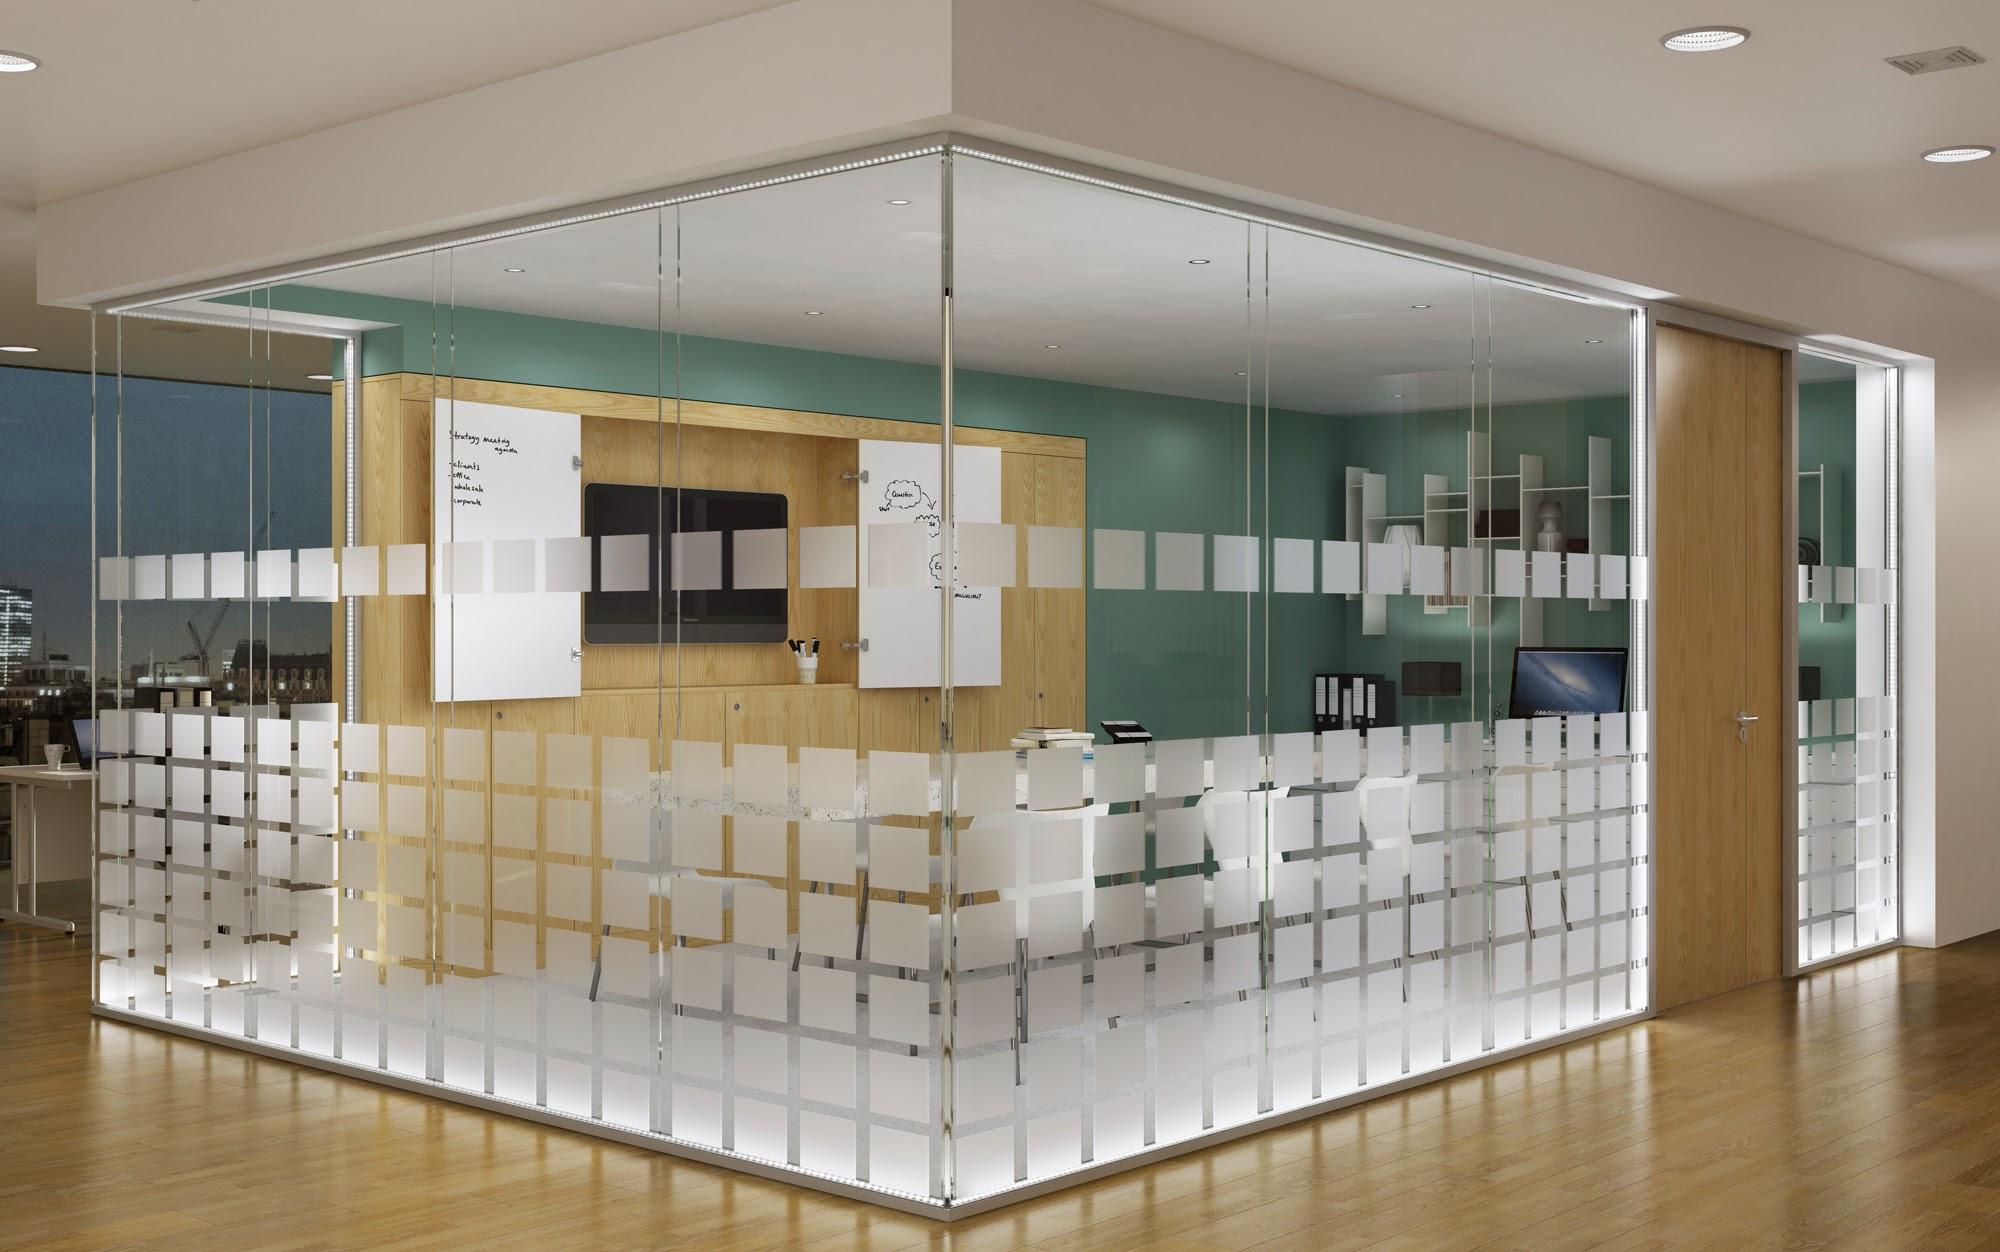 Office-Glazing-Partions1.jpg